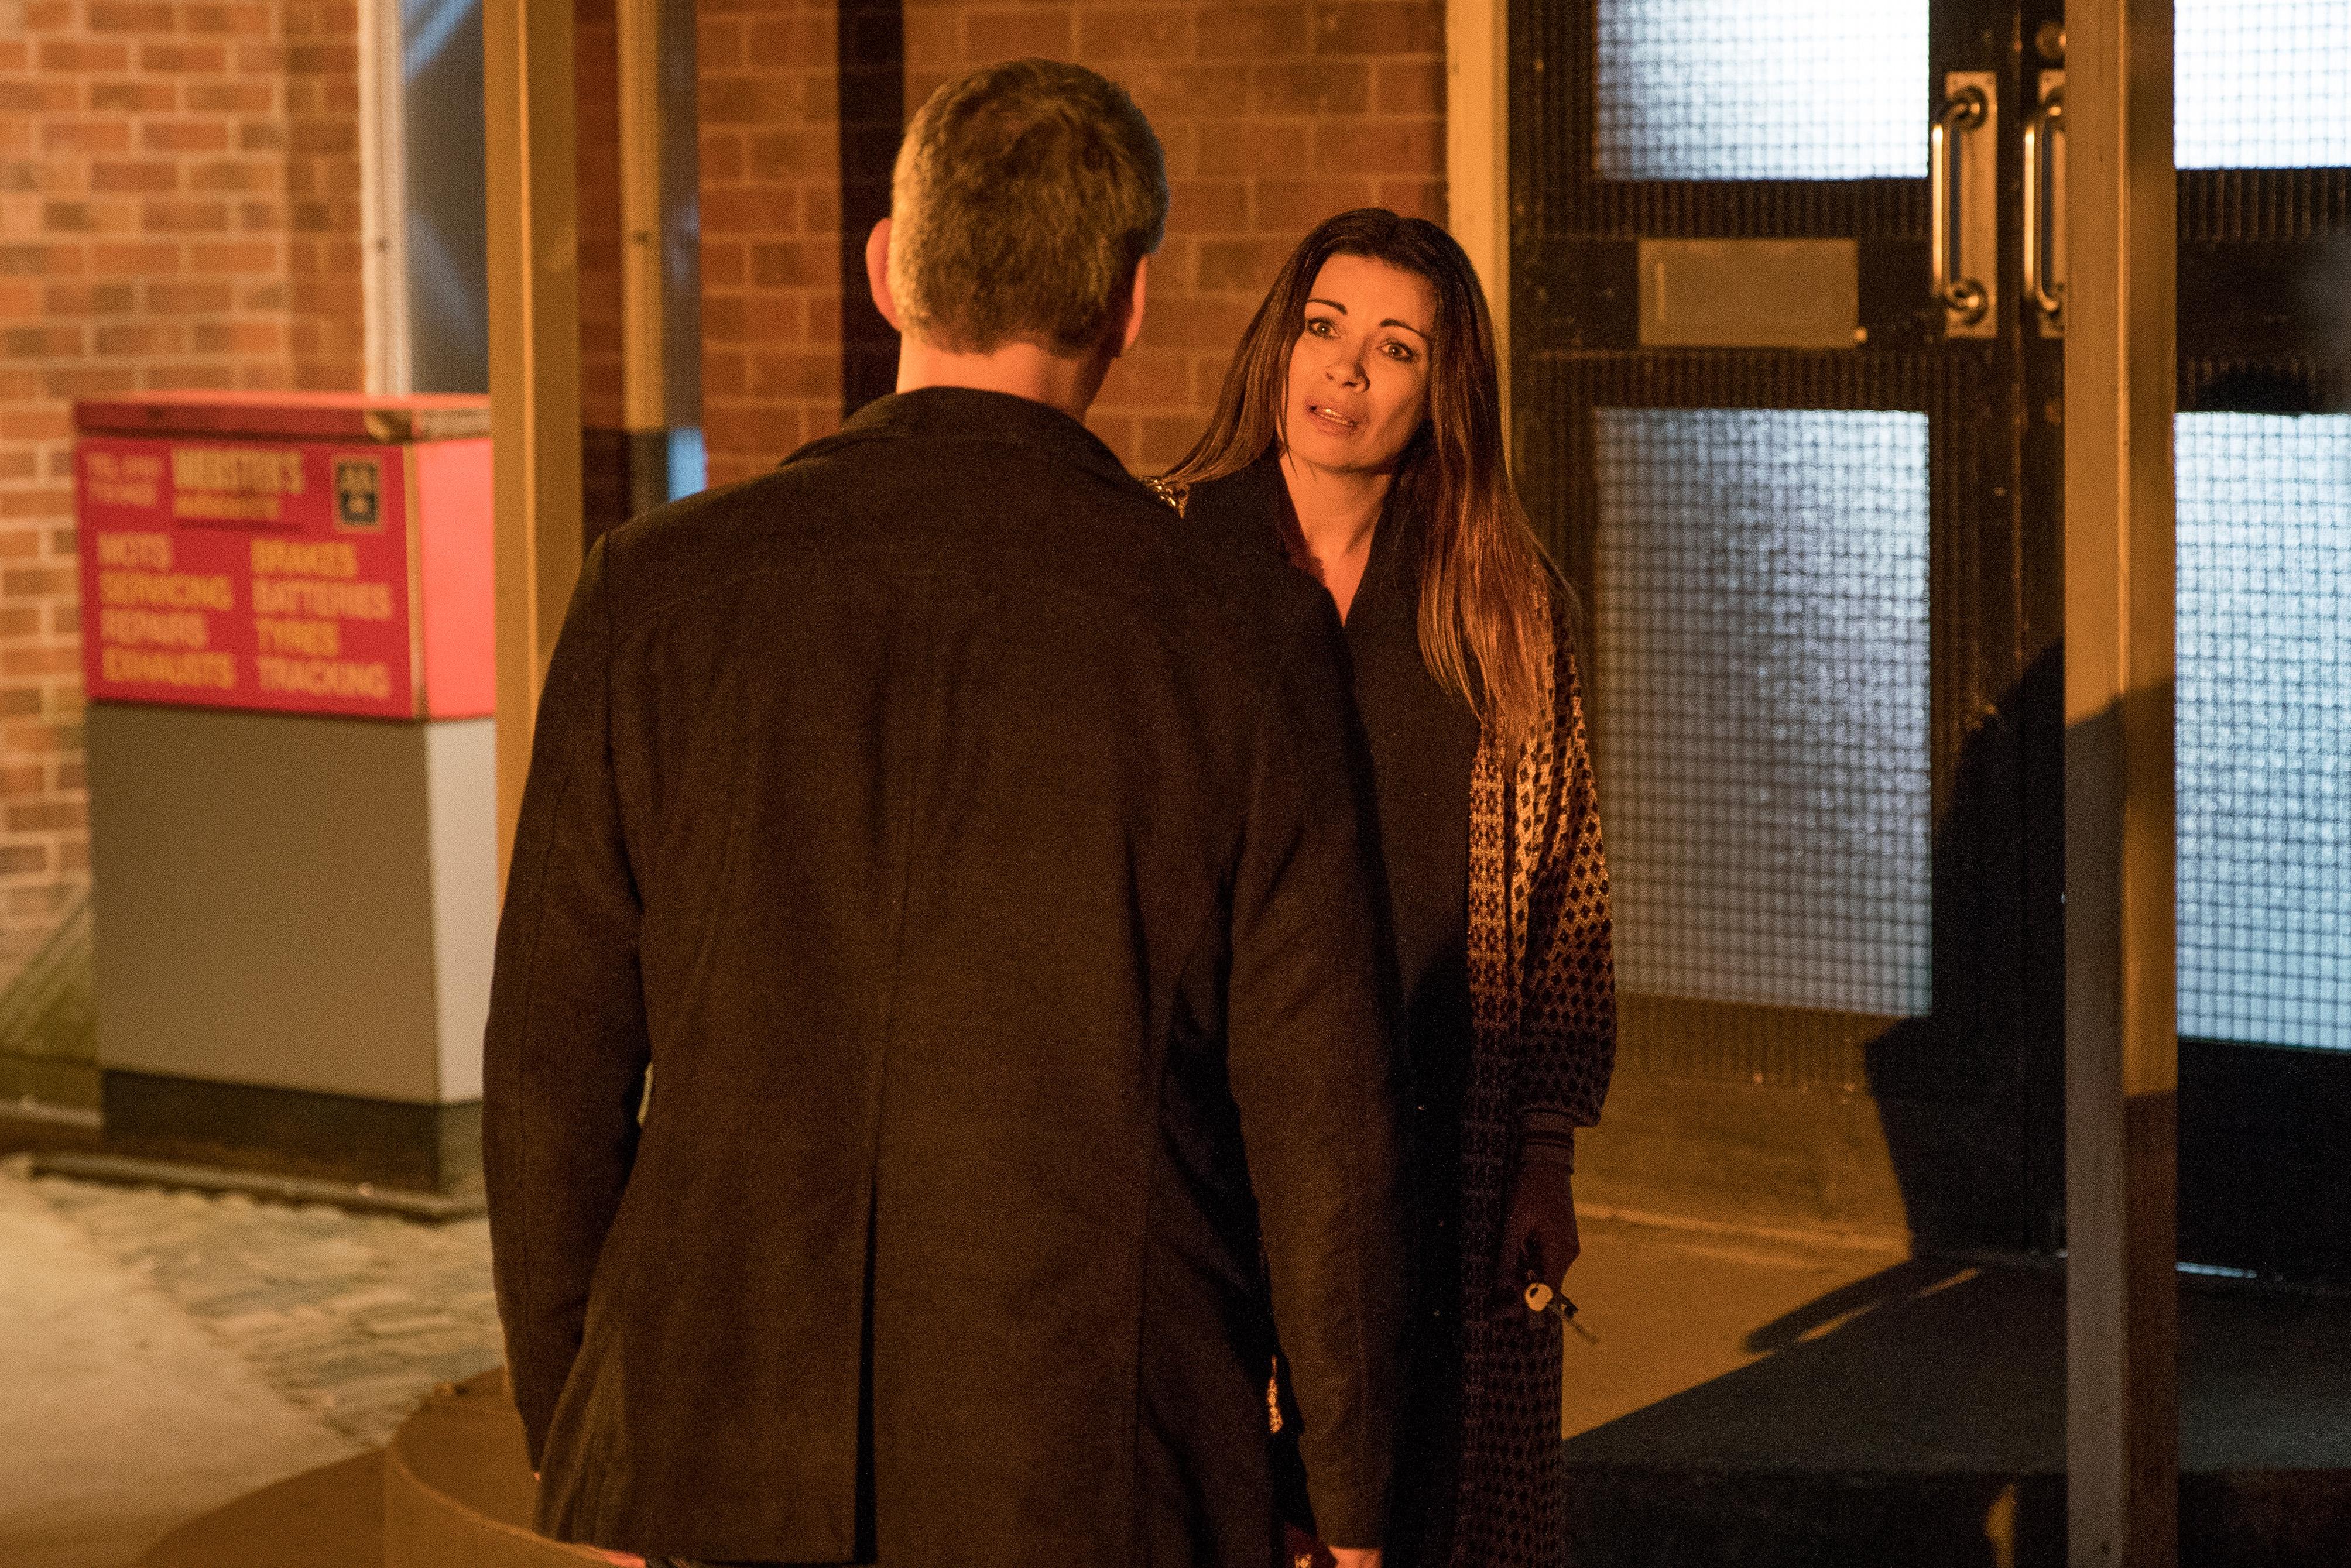 Robert confronts Carla in Coronation Street